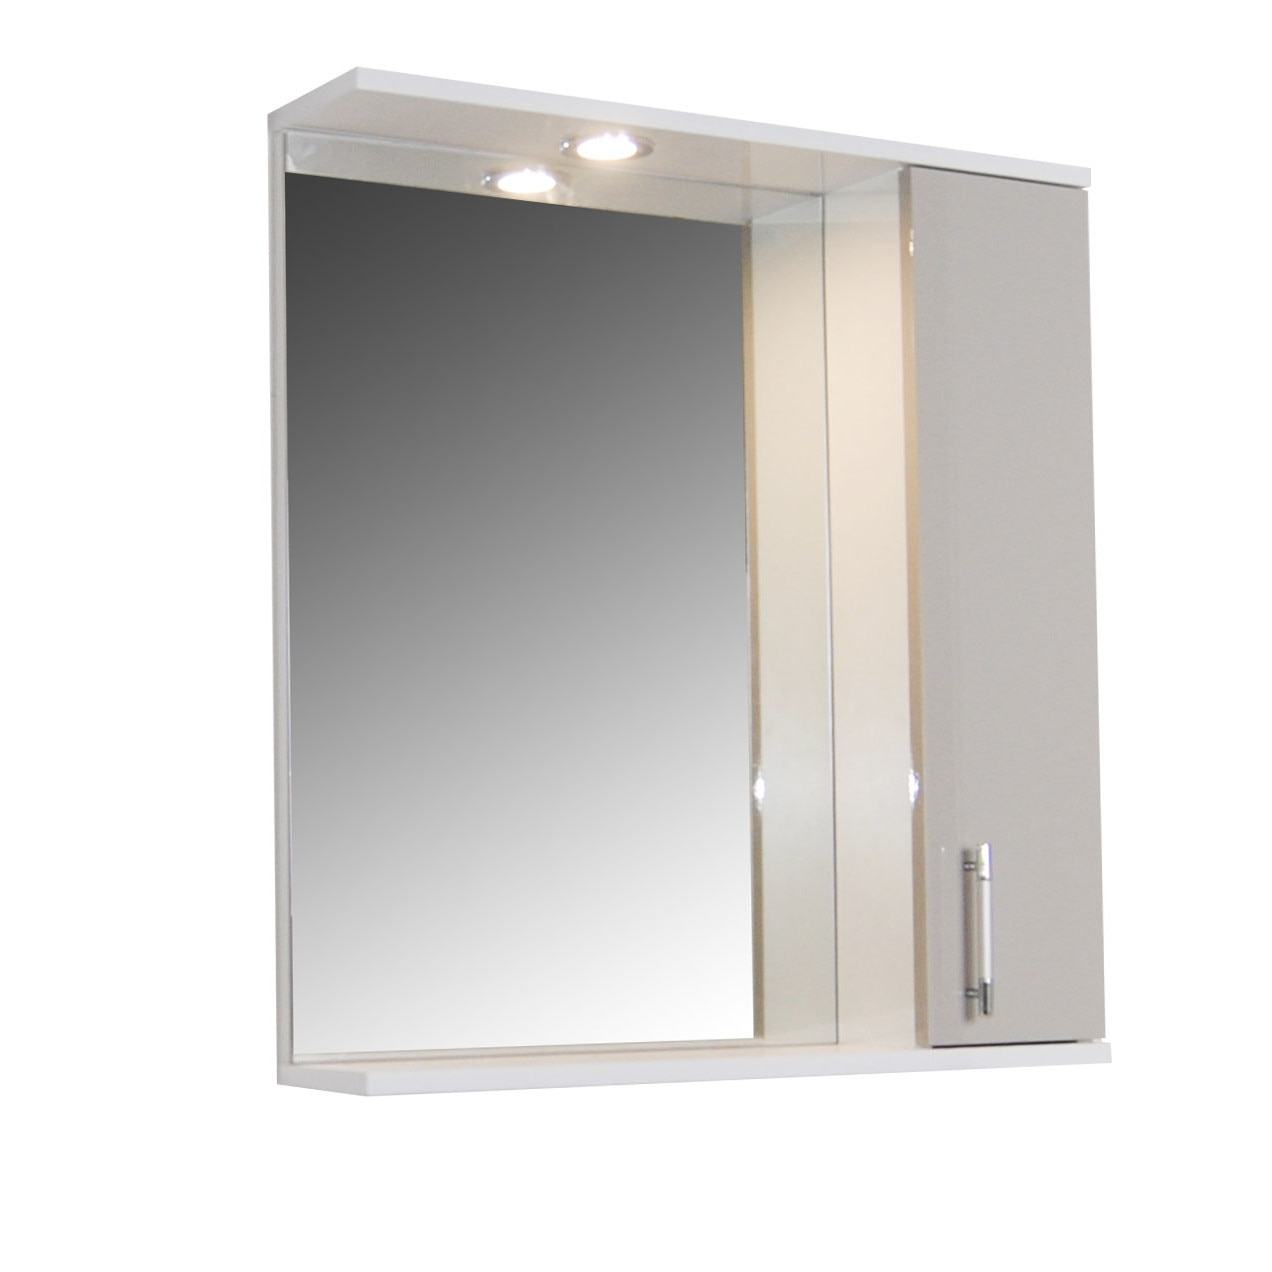 Fotografie Oglinda baie cu dulap si iluminare Badenmob 020, 2 rafturi, MDF, PAL, 71x65x14 cm, RAL 7044